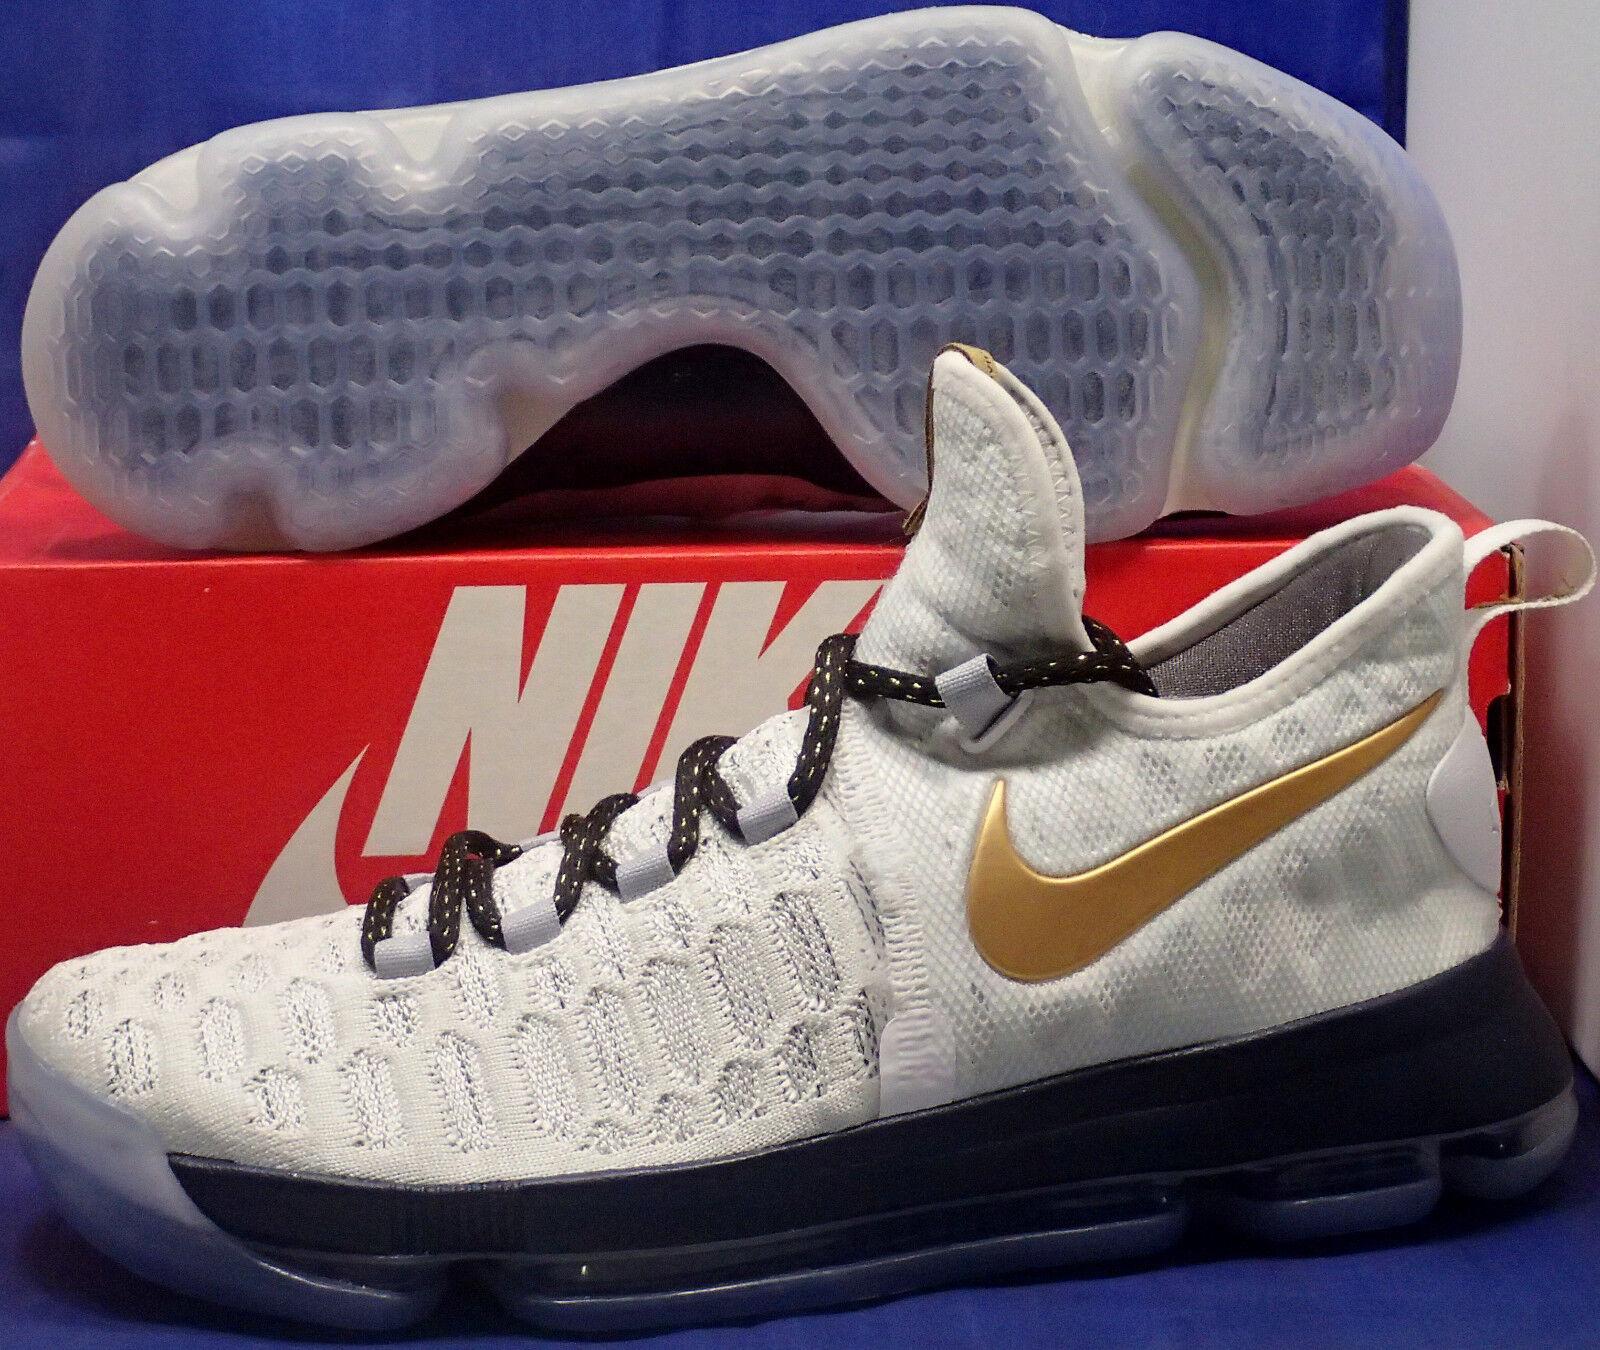 Nike KD 9 IX iD blanc Navy Bleu Gold Olympic Kevin Durant SZ 9.5